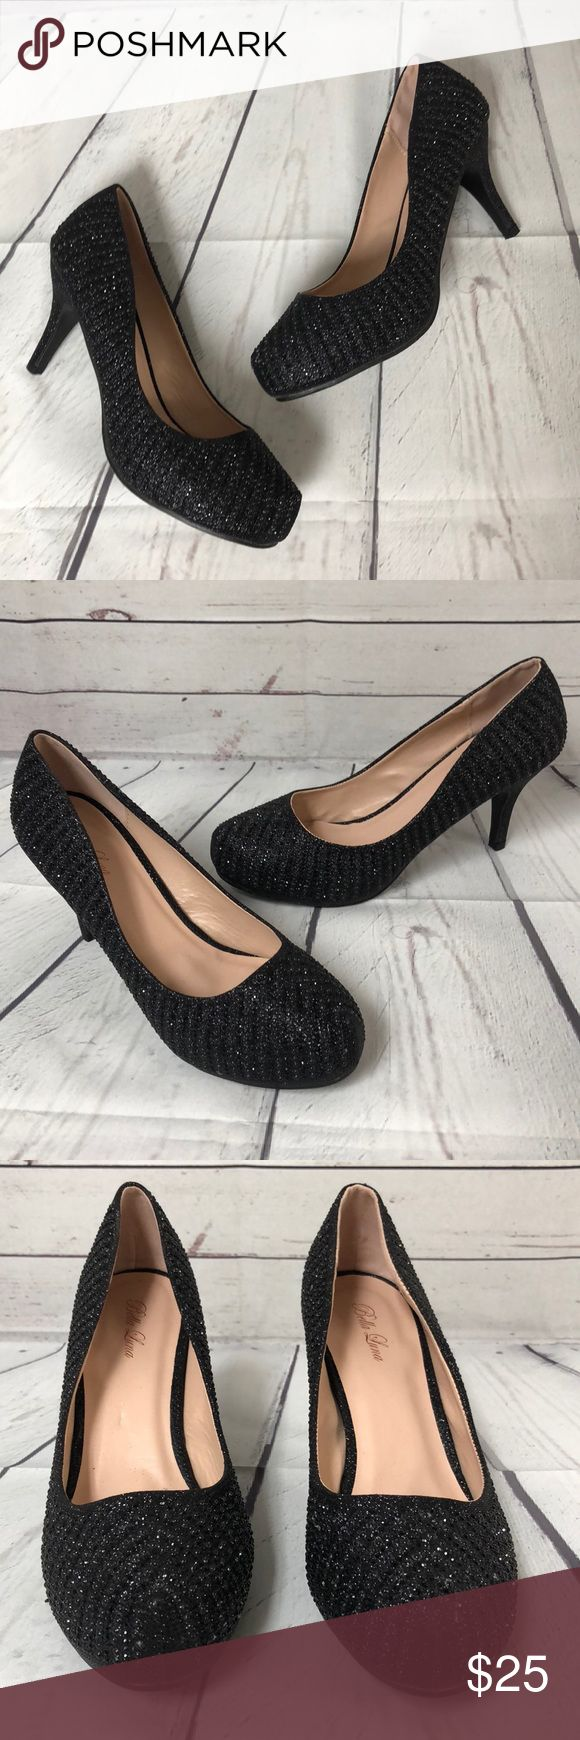 "Bella Luna sparkle beaded black heels 10 new Never used.  Minor shelf wear.  Smoke free.    Heel height 3.5"" bella luna Shoes Heels"